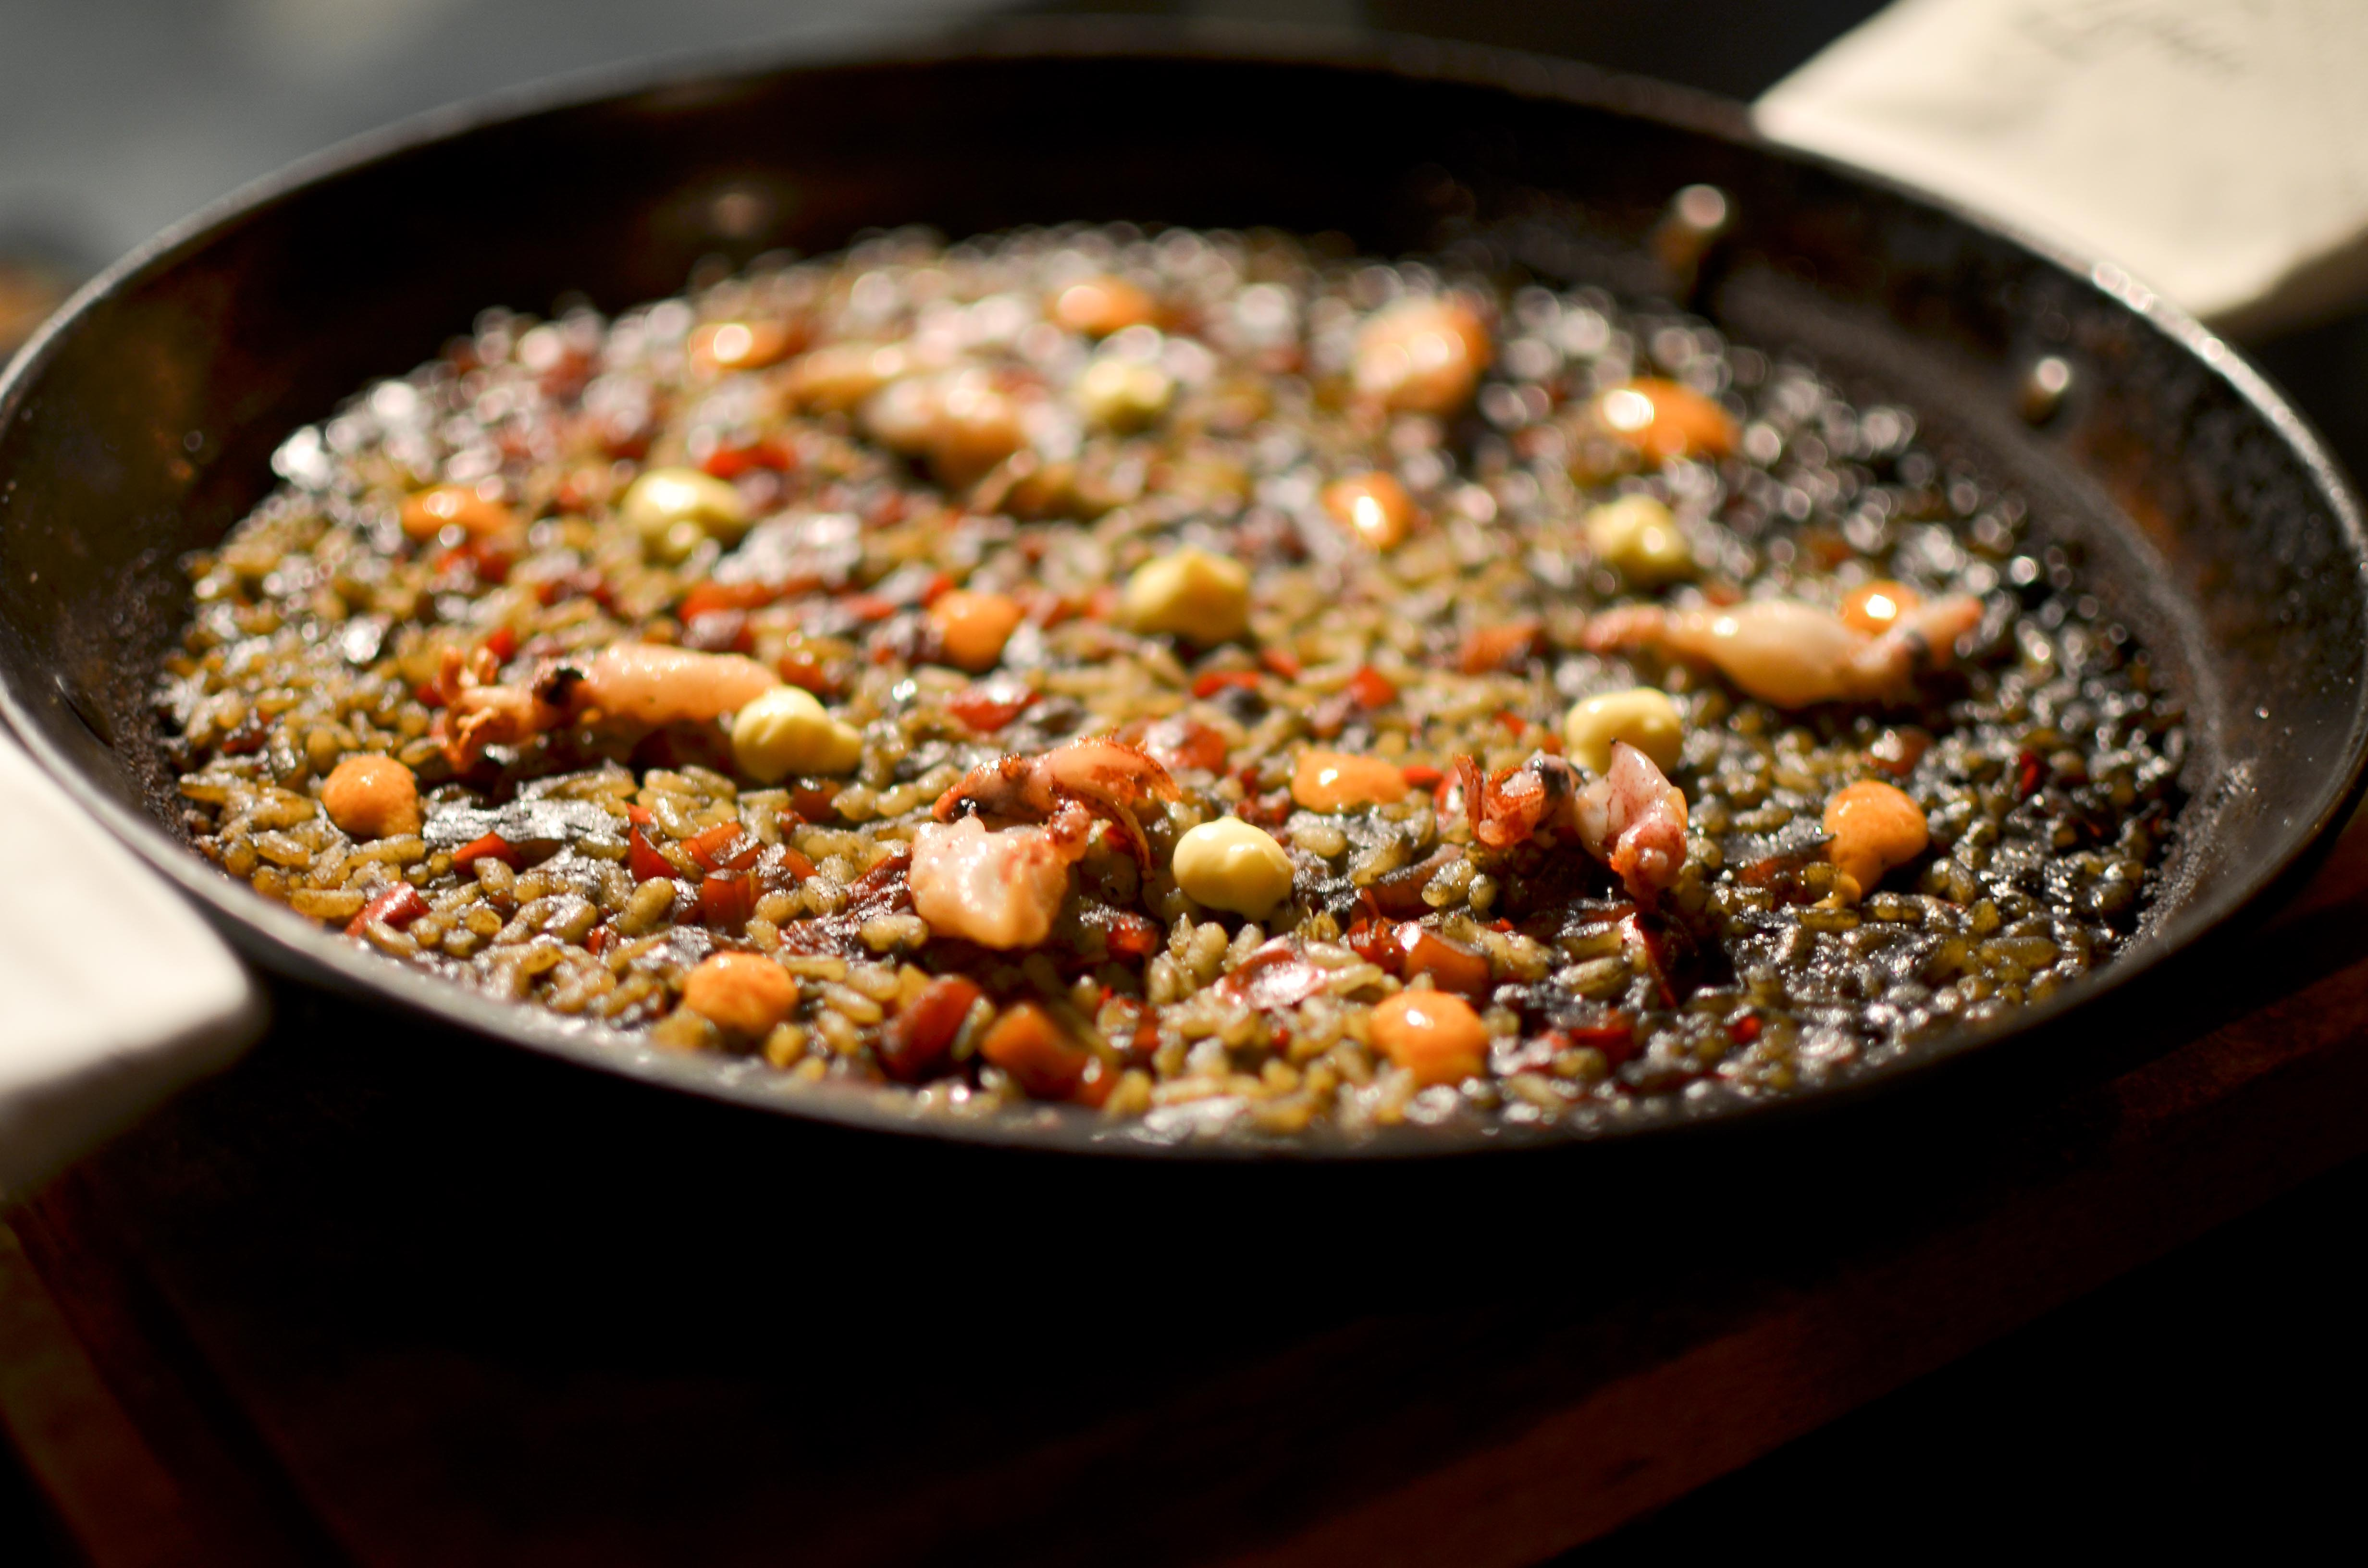 Voila, black paella